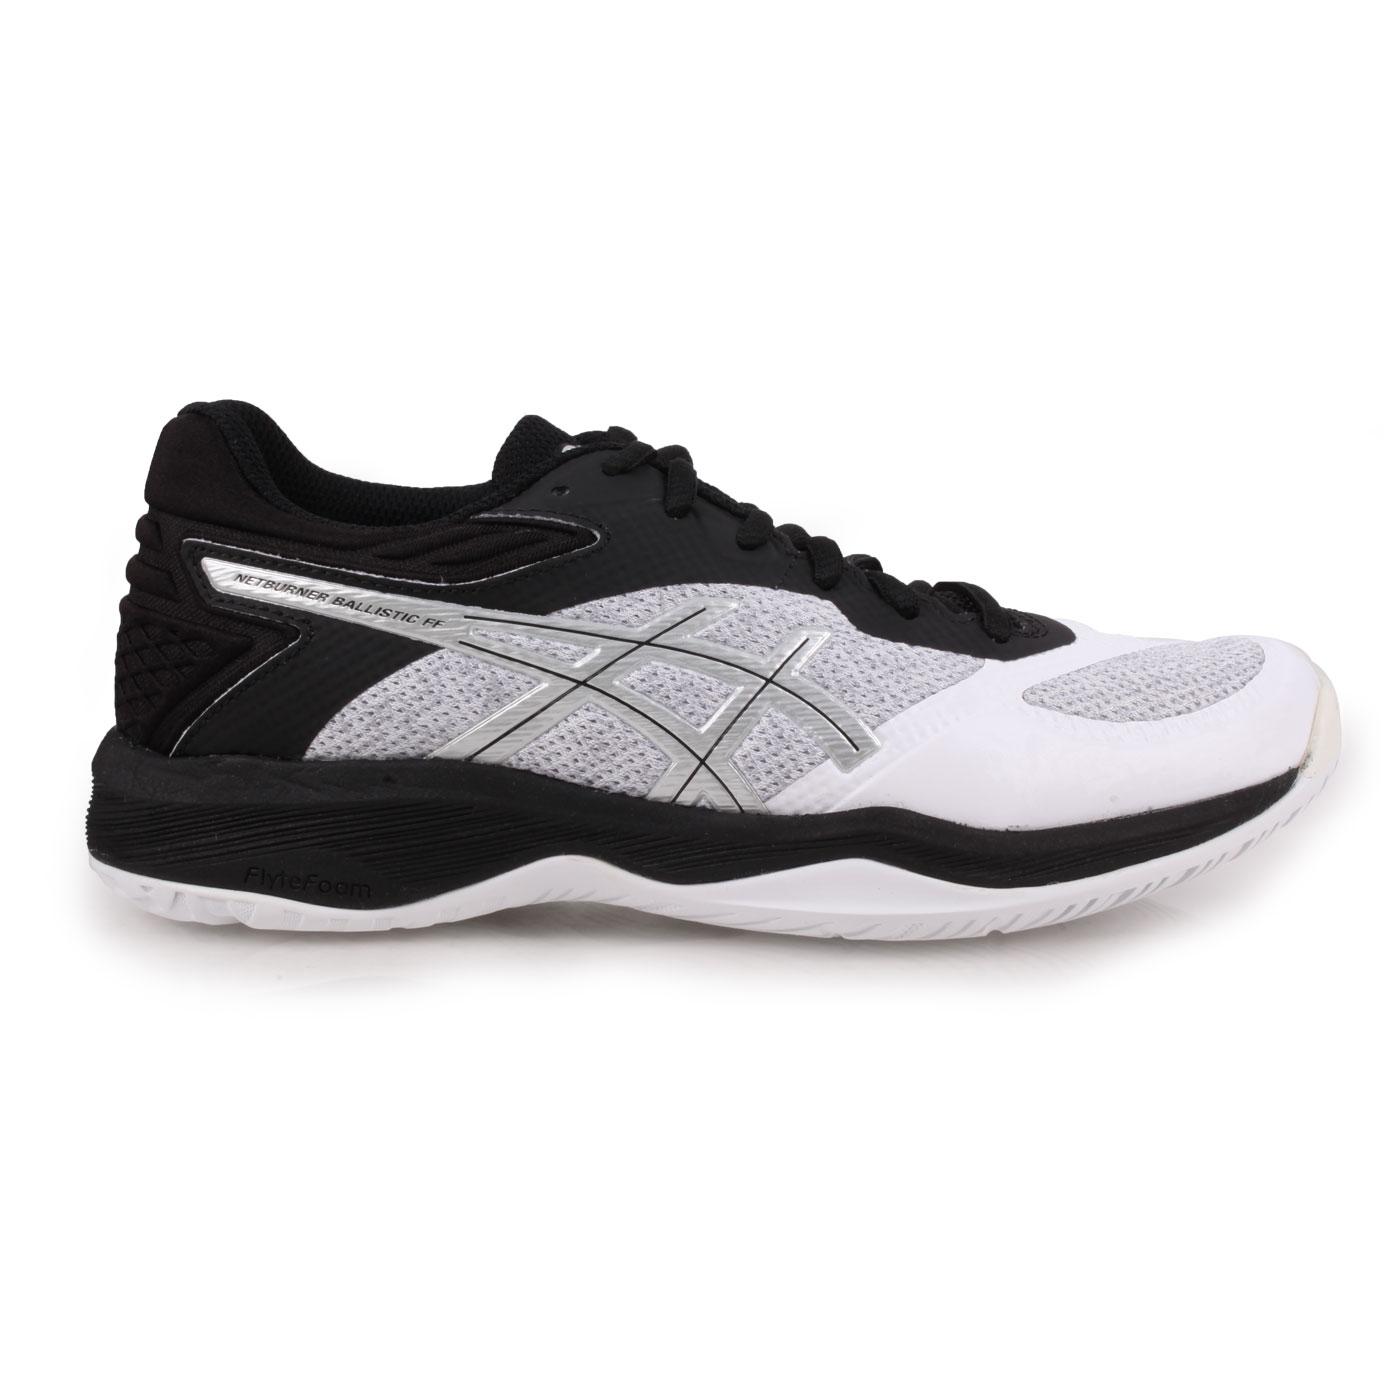 ASICS 女款排羽球鞋  @NETBURNER BALLISTIC@1052A002-100 - 黑白